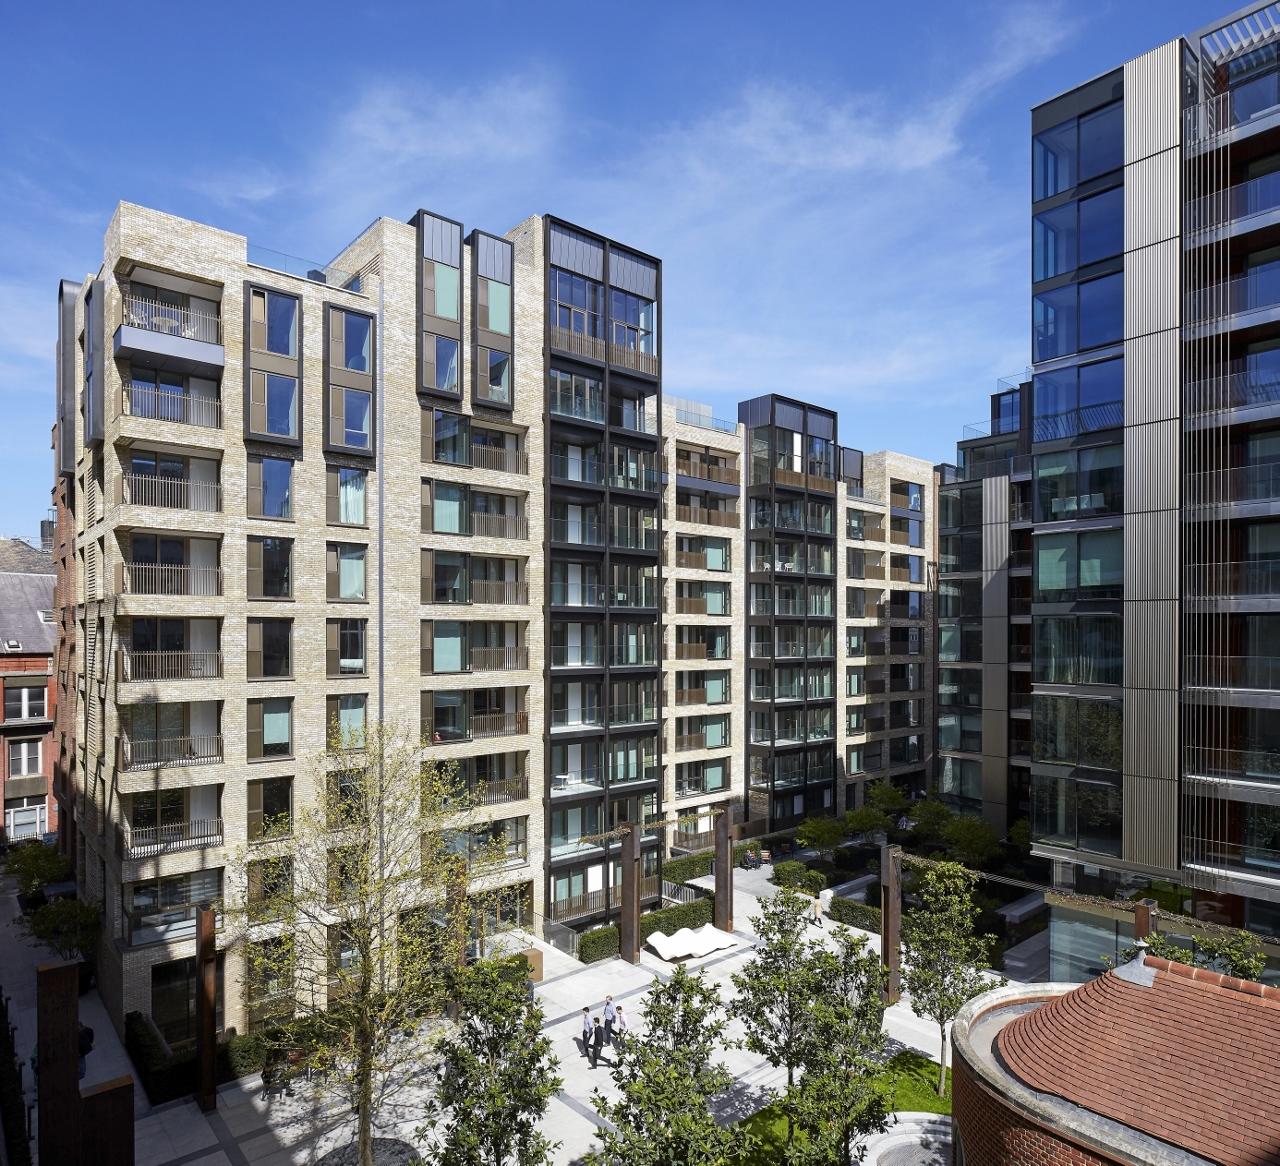 Fitzroy Place, London